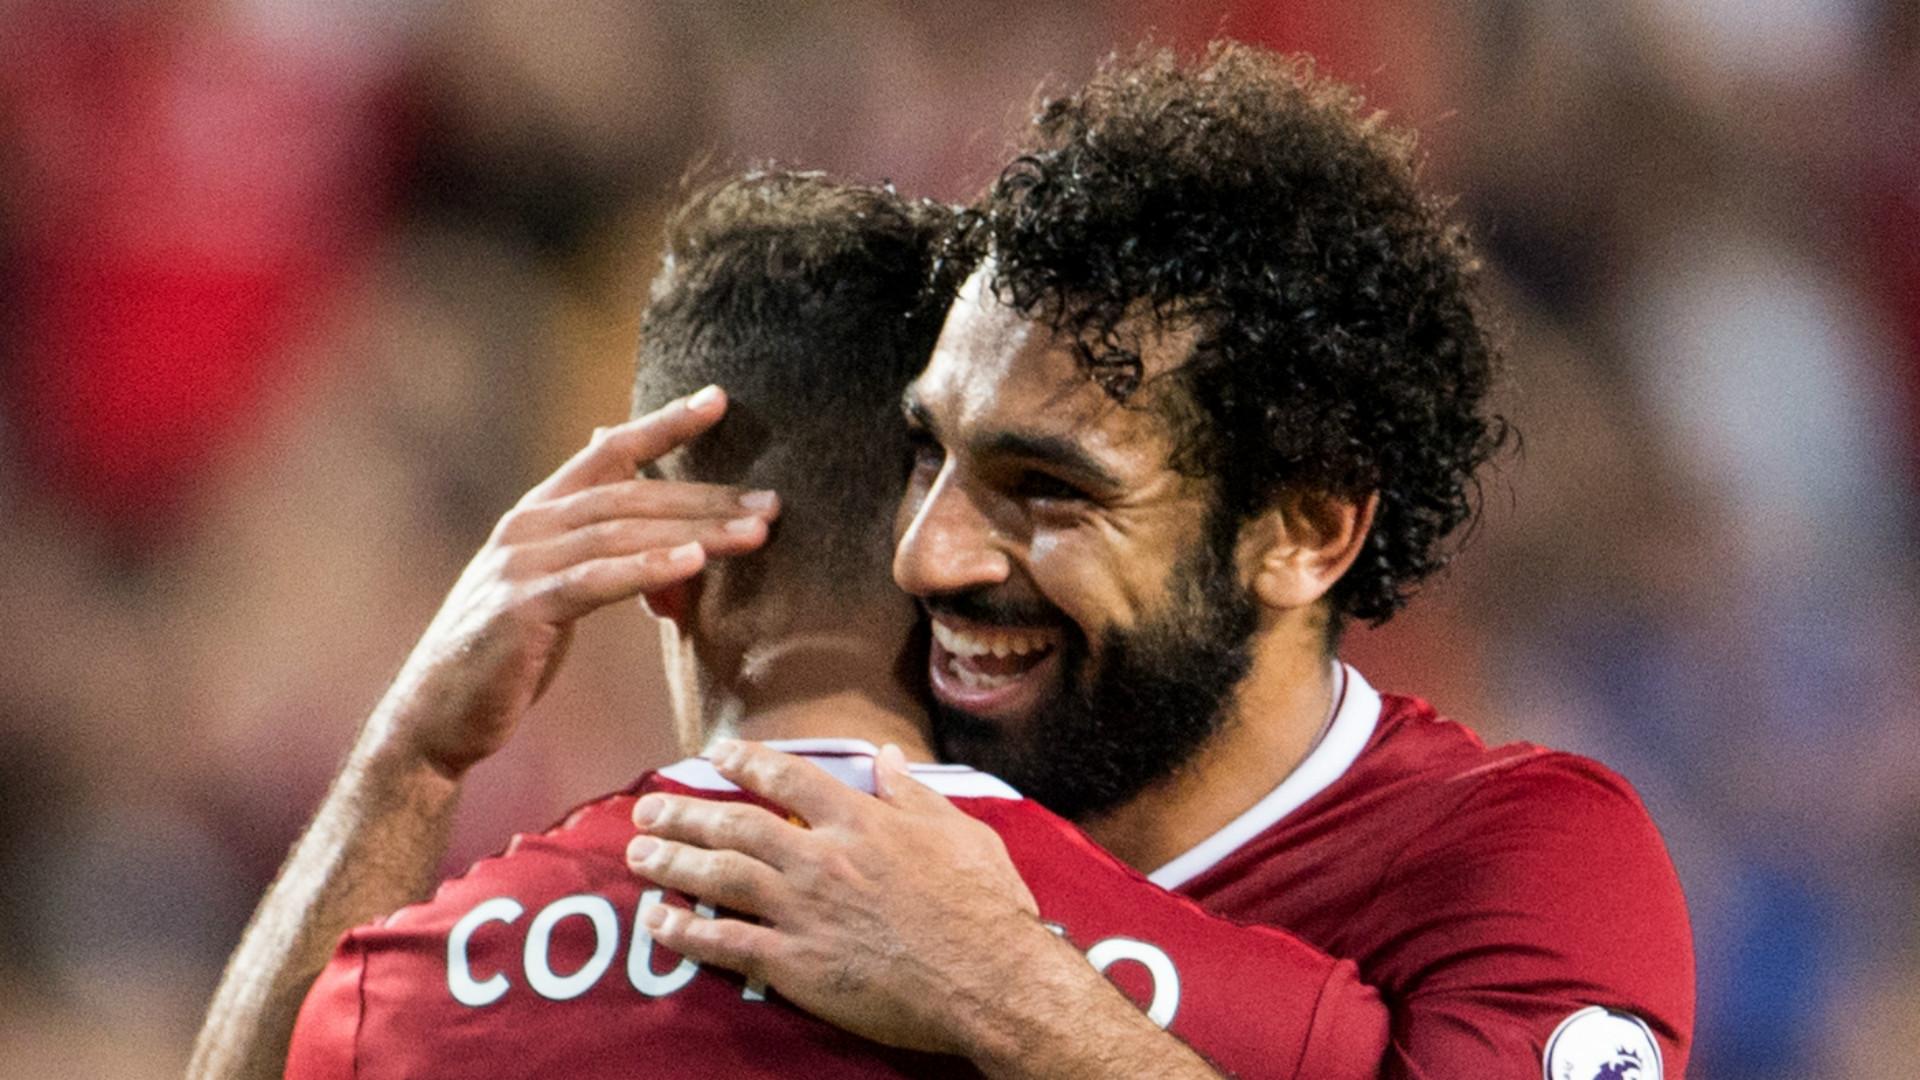 Liverpool will compete for the Premier League title - Jurgen Klopp